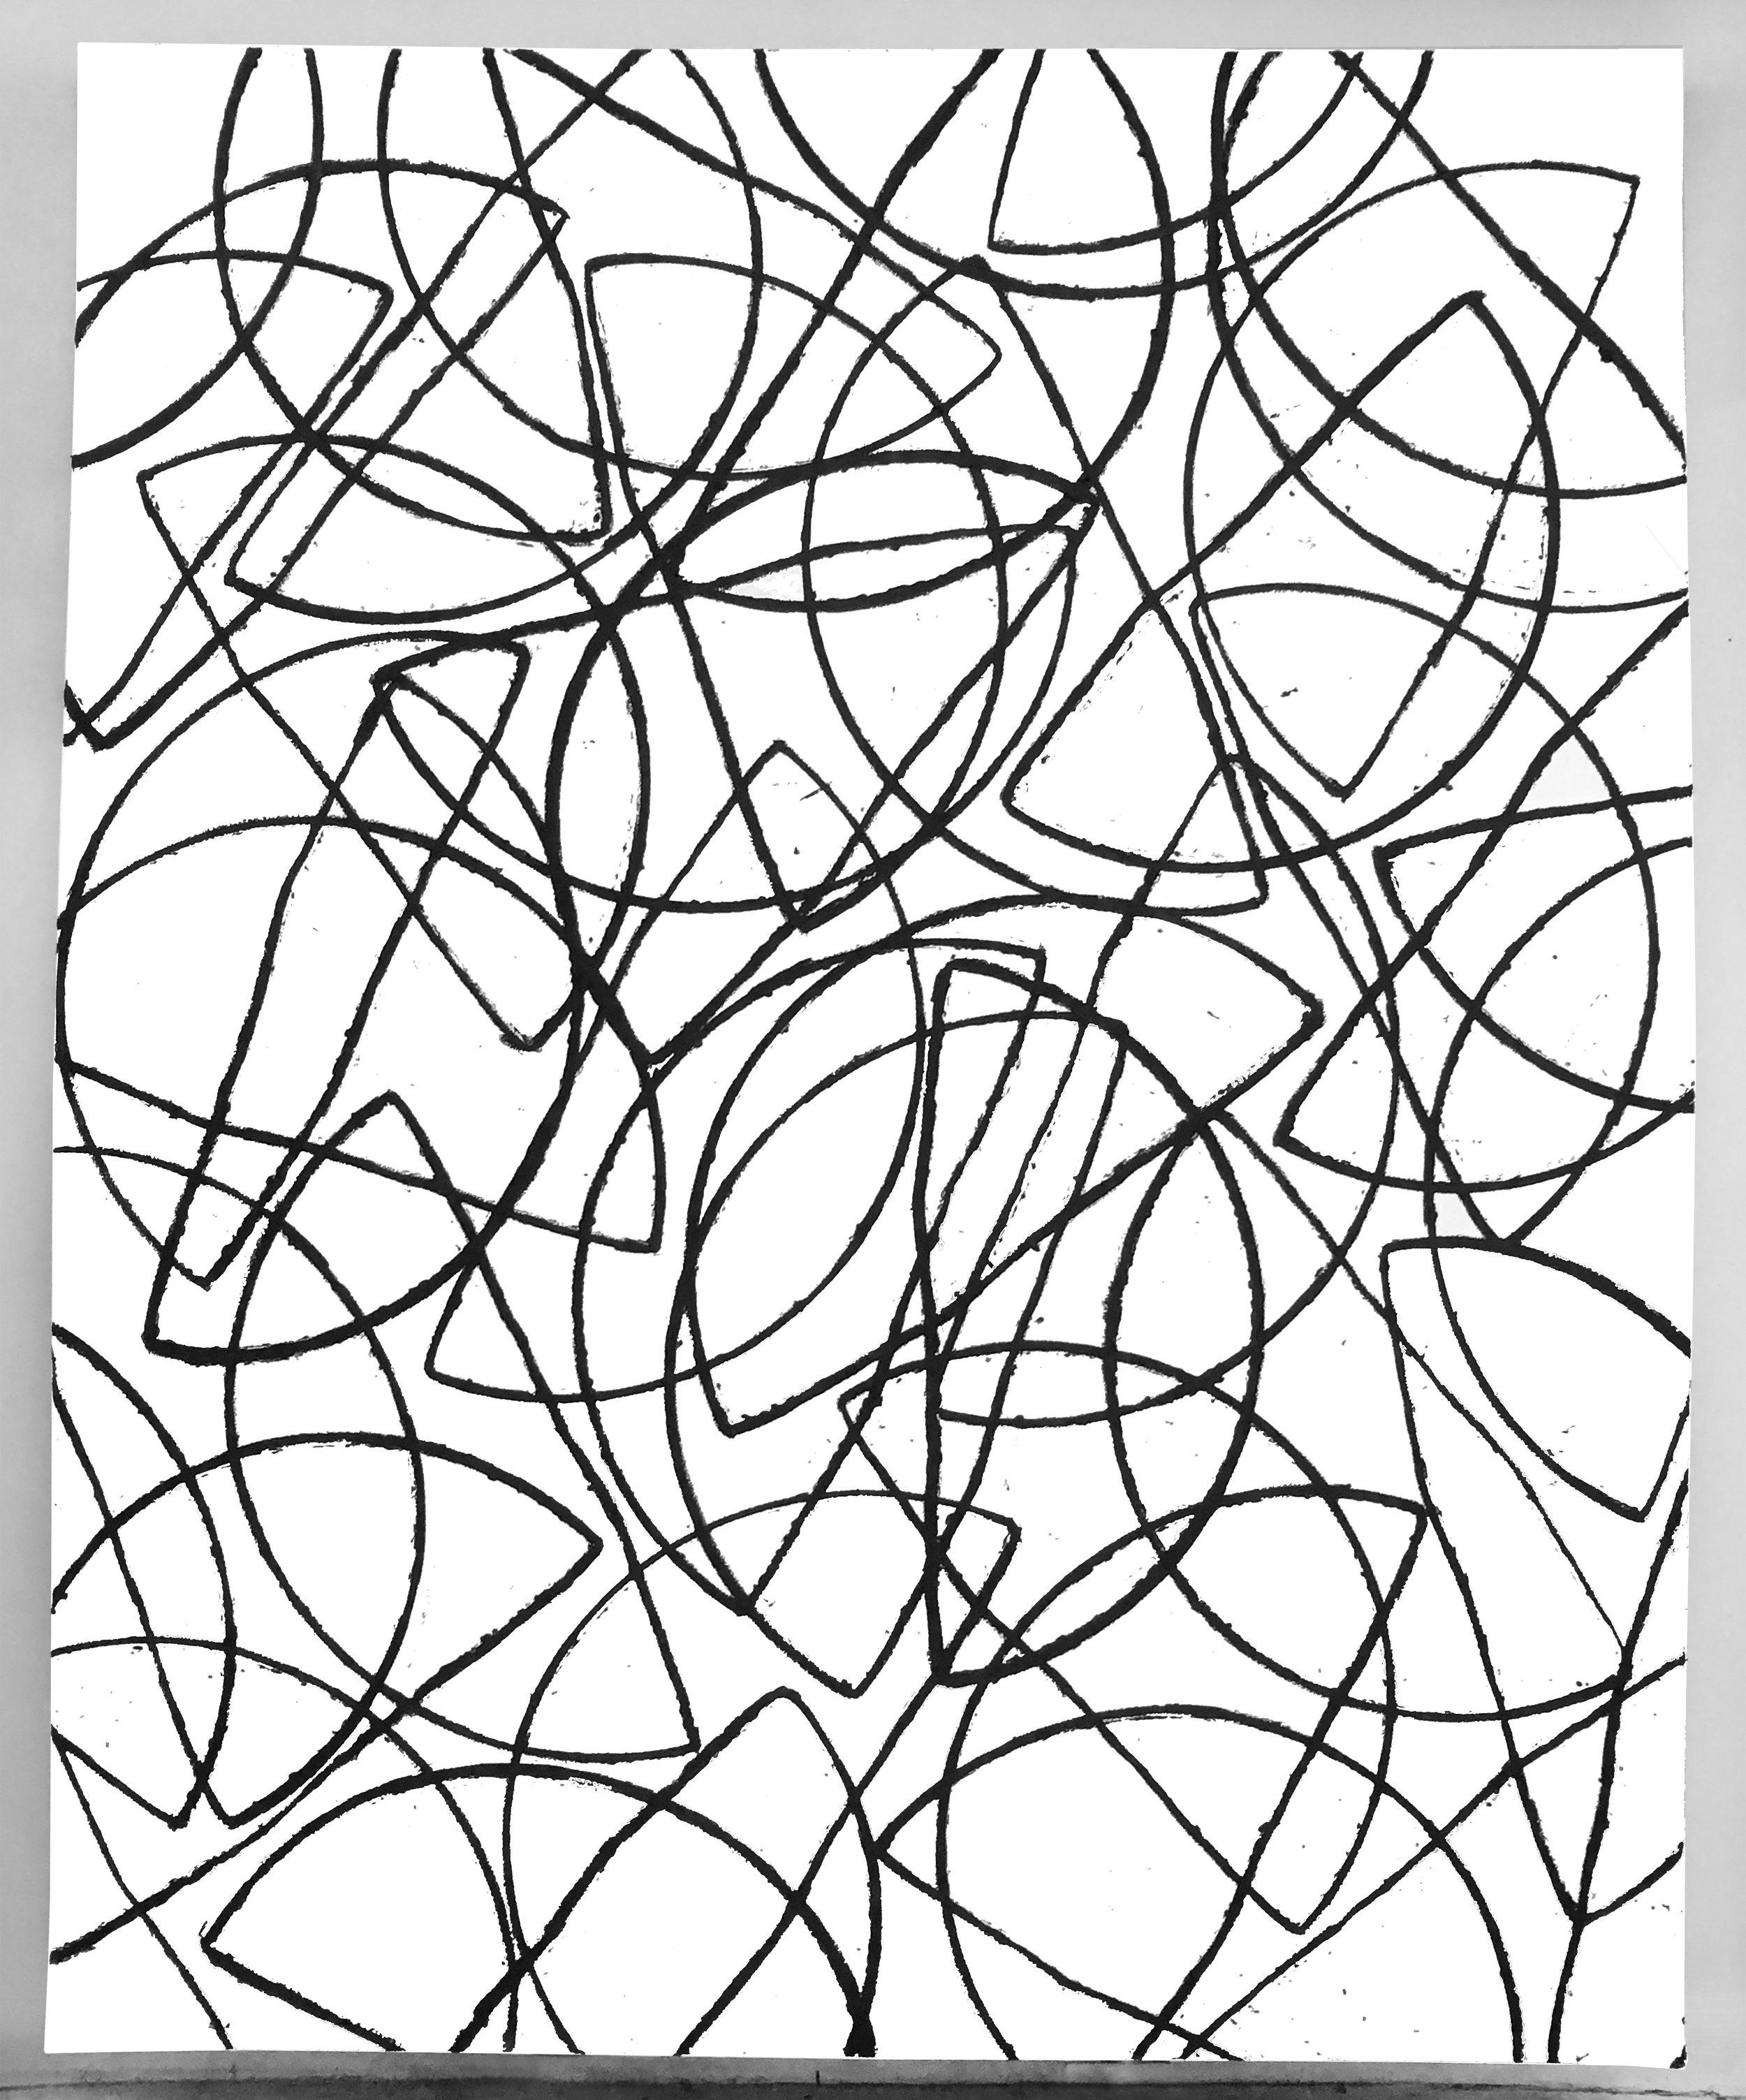 Semis, 2016, oilbar on canvas, 92 x 74 x 3 inches